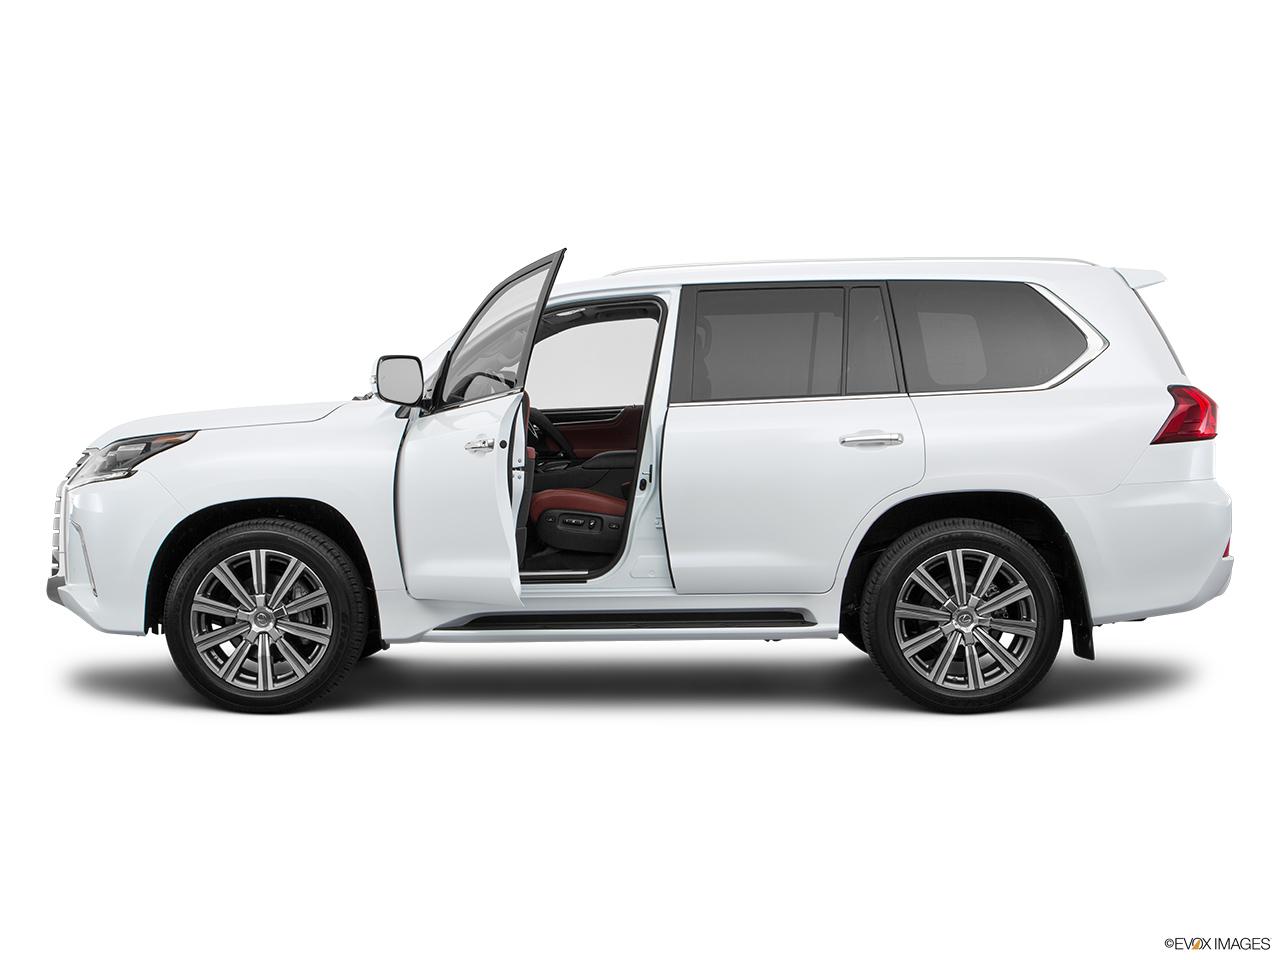 Lexus lx 2016 570 premier oman driver s side profile with drivers side door open